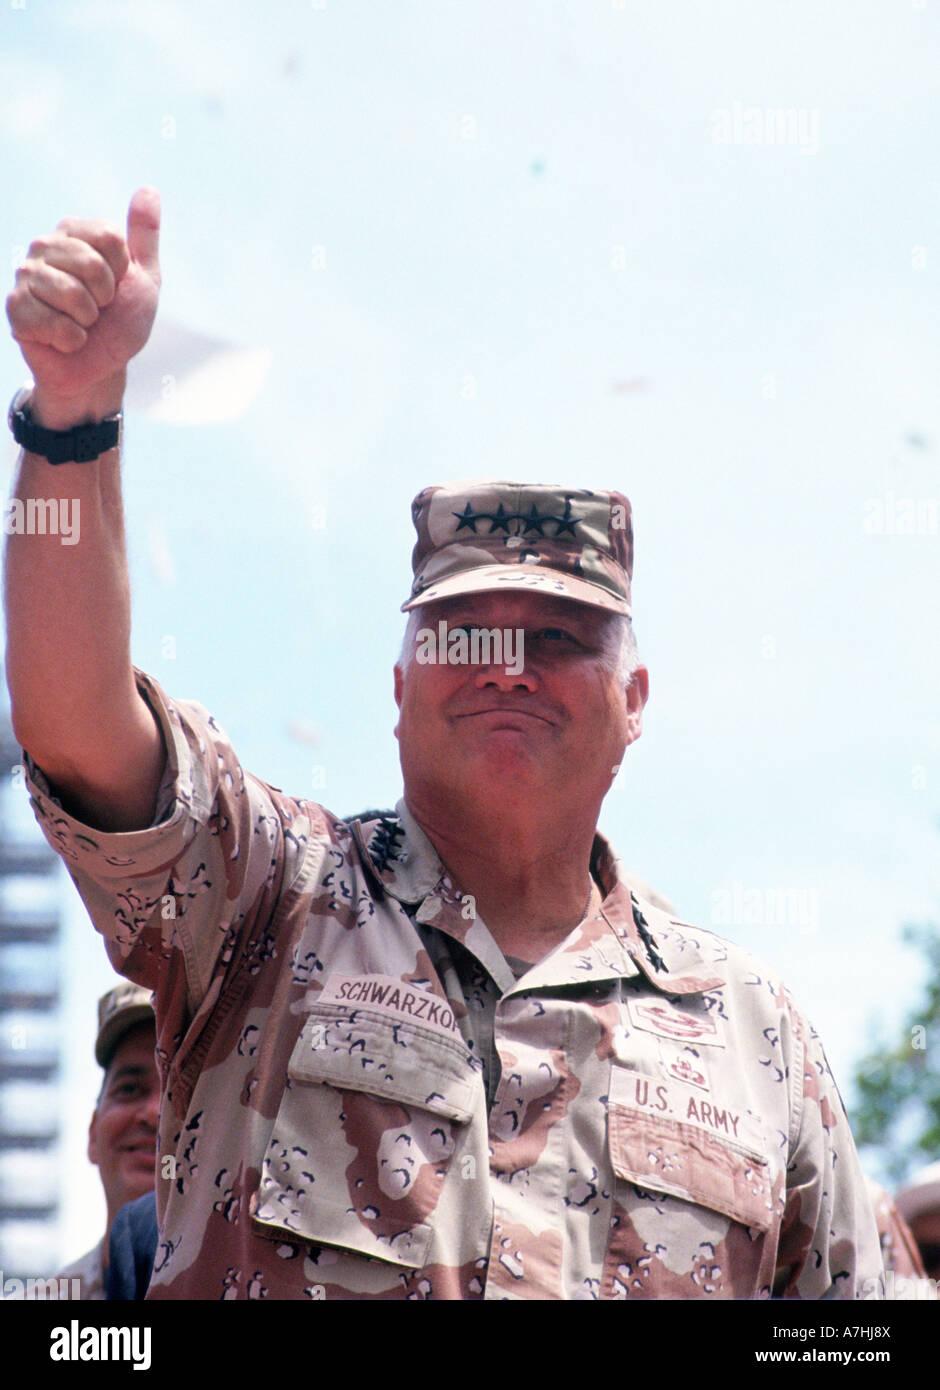 GENERAL NORMAN SCHWARZKOPF - US soldier  during Operation Desert Storm in 1991 - Stock Image